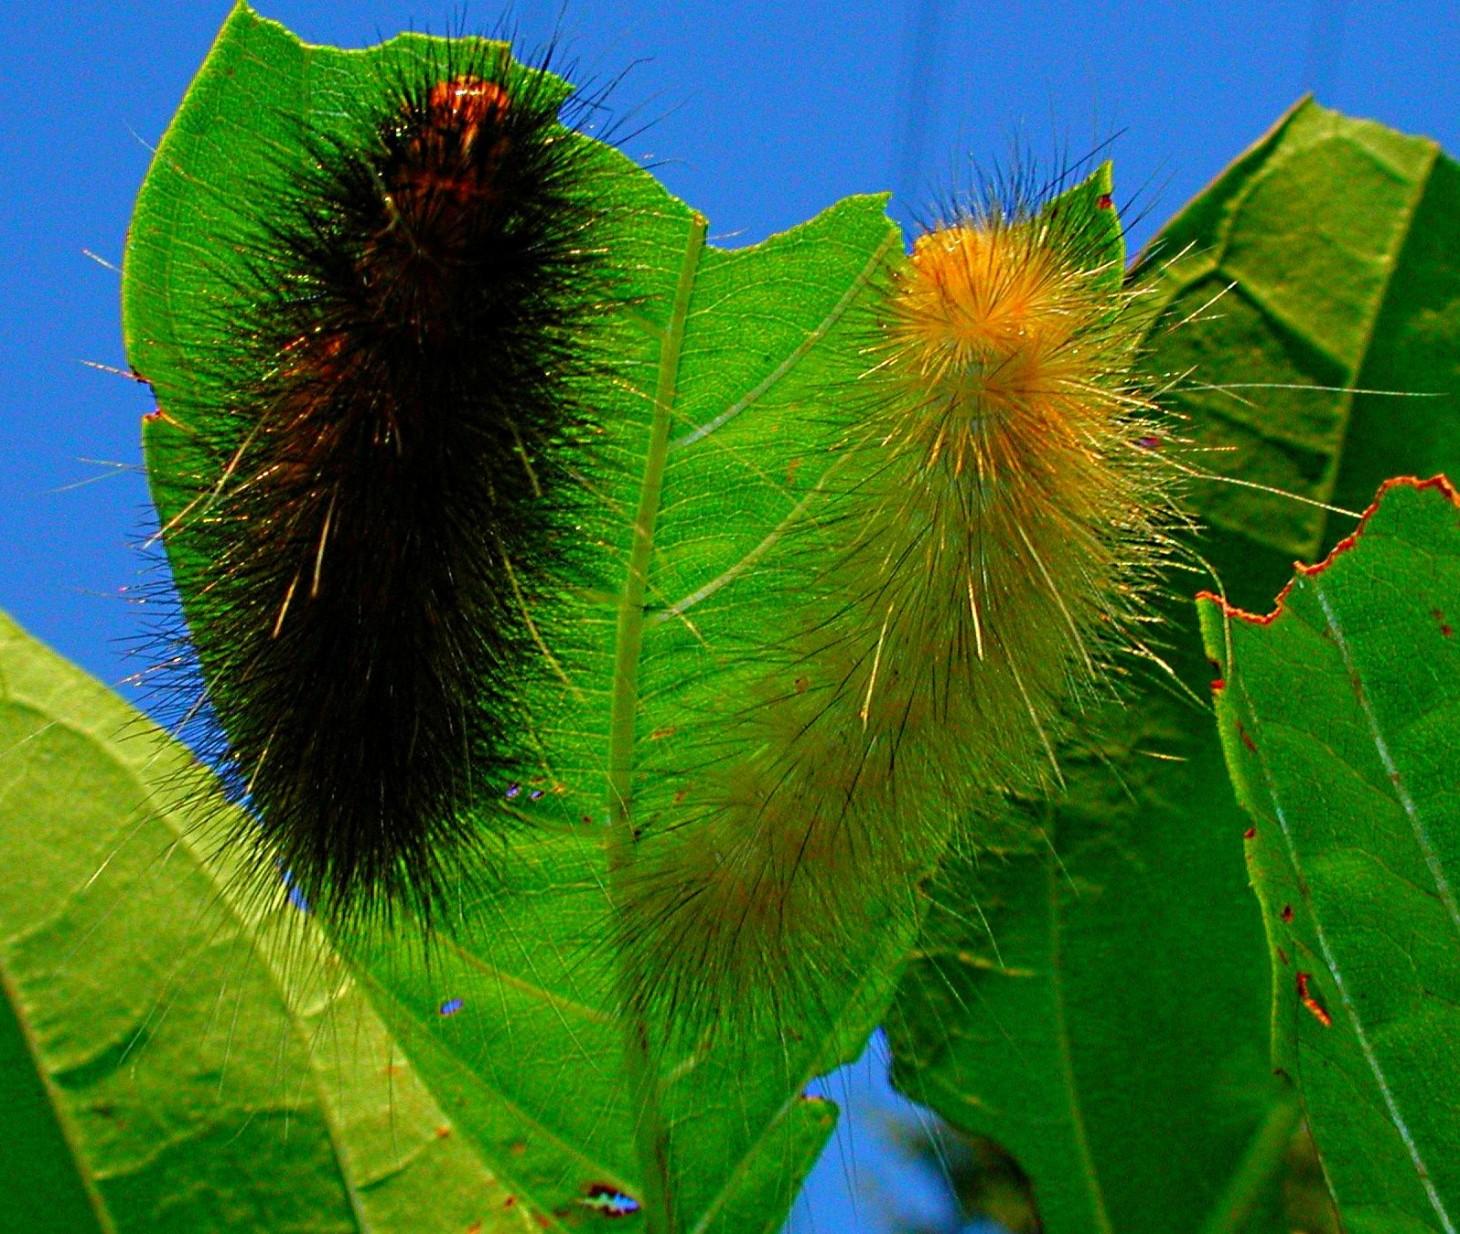 Fuzzy Caterpillars or Shih Tzu Pups?! Photo by Thomas Peace 2014